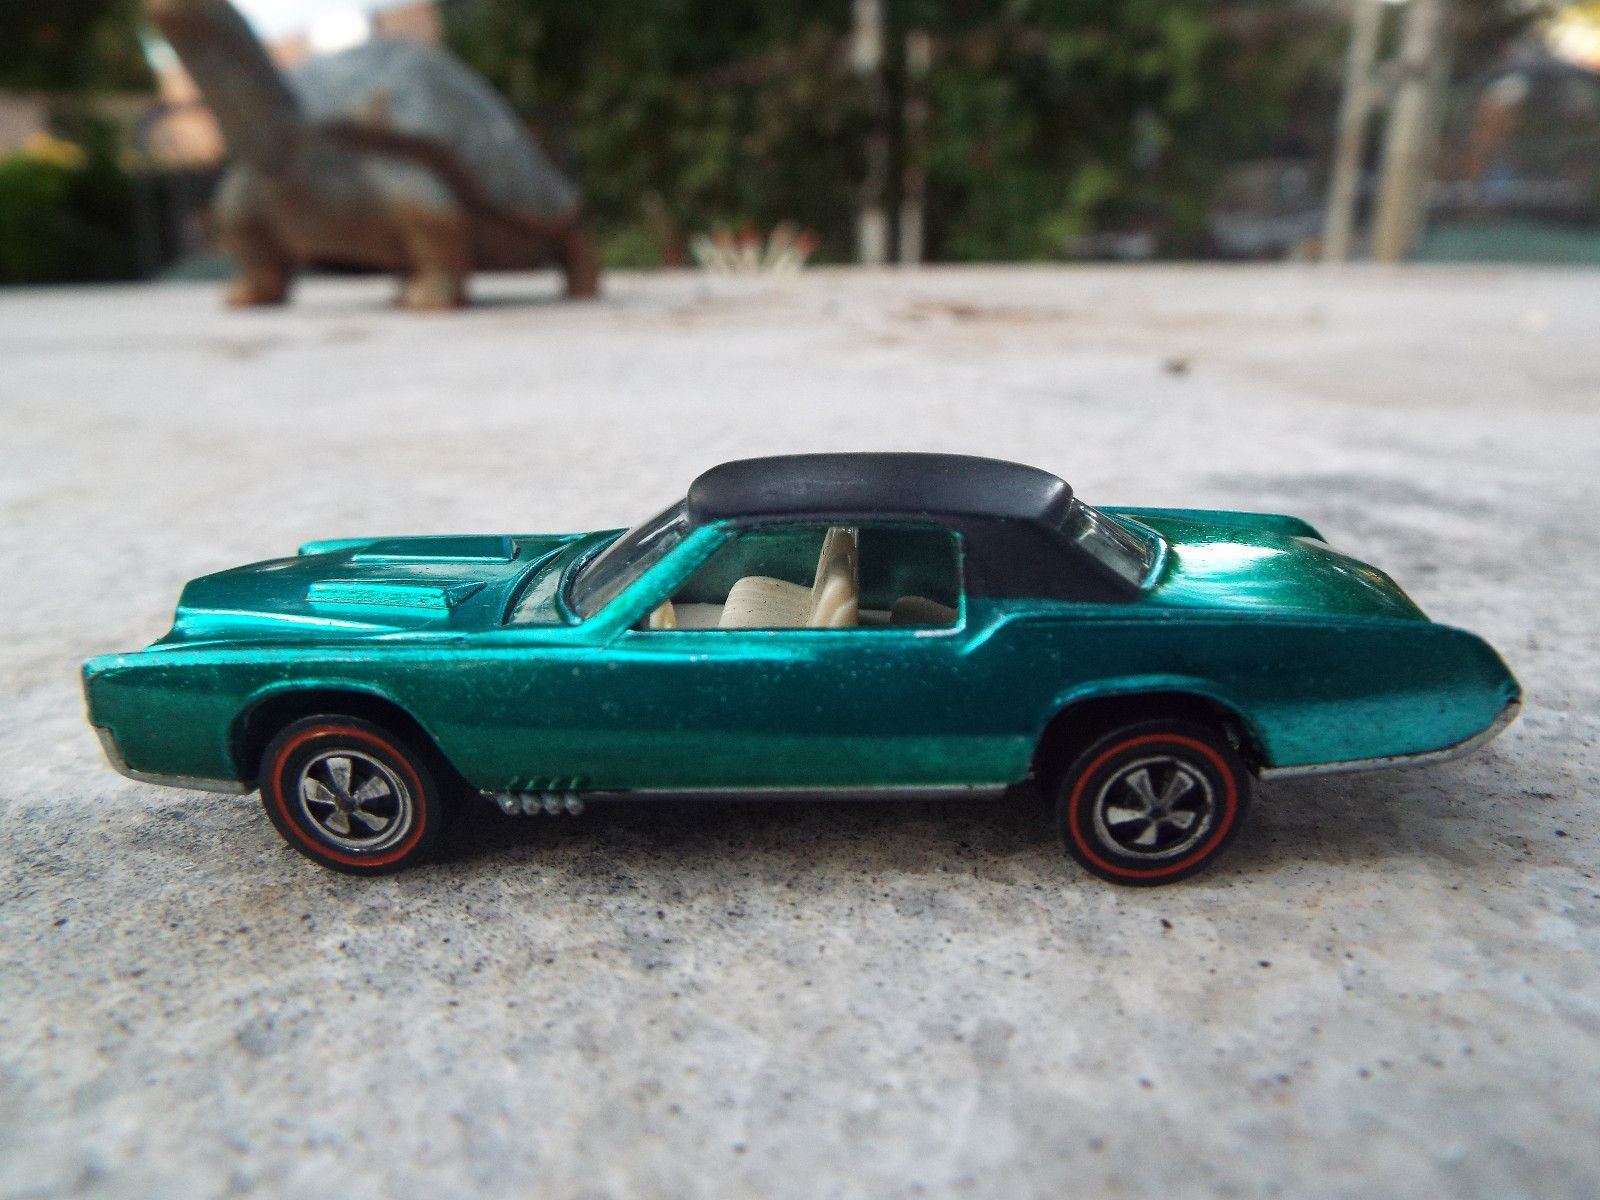 Redline Hotwheels Green 1968 Custom Eldorado Vintage hot